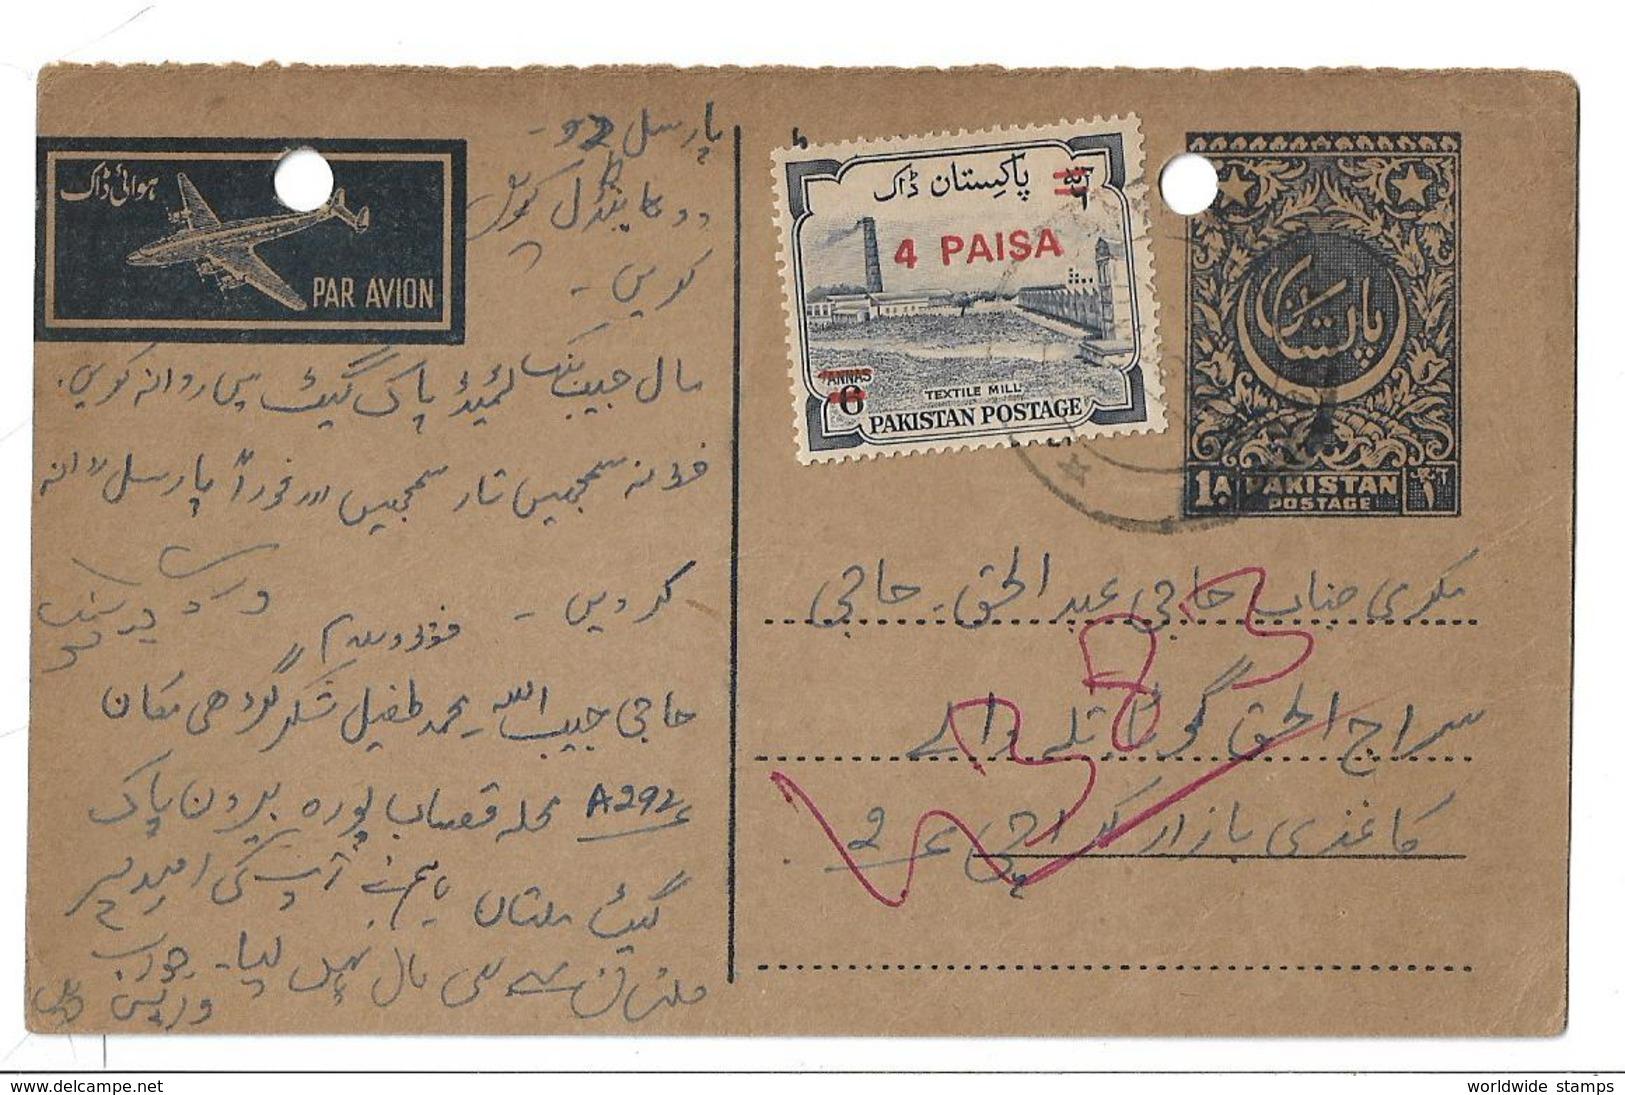 PAKISTAN 1A Prepaid POST CARD, 1956 Over Print 4 Paisa On  6a,Textile Mill - Pakistan